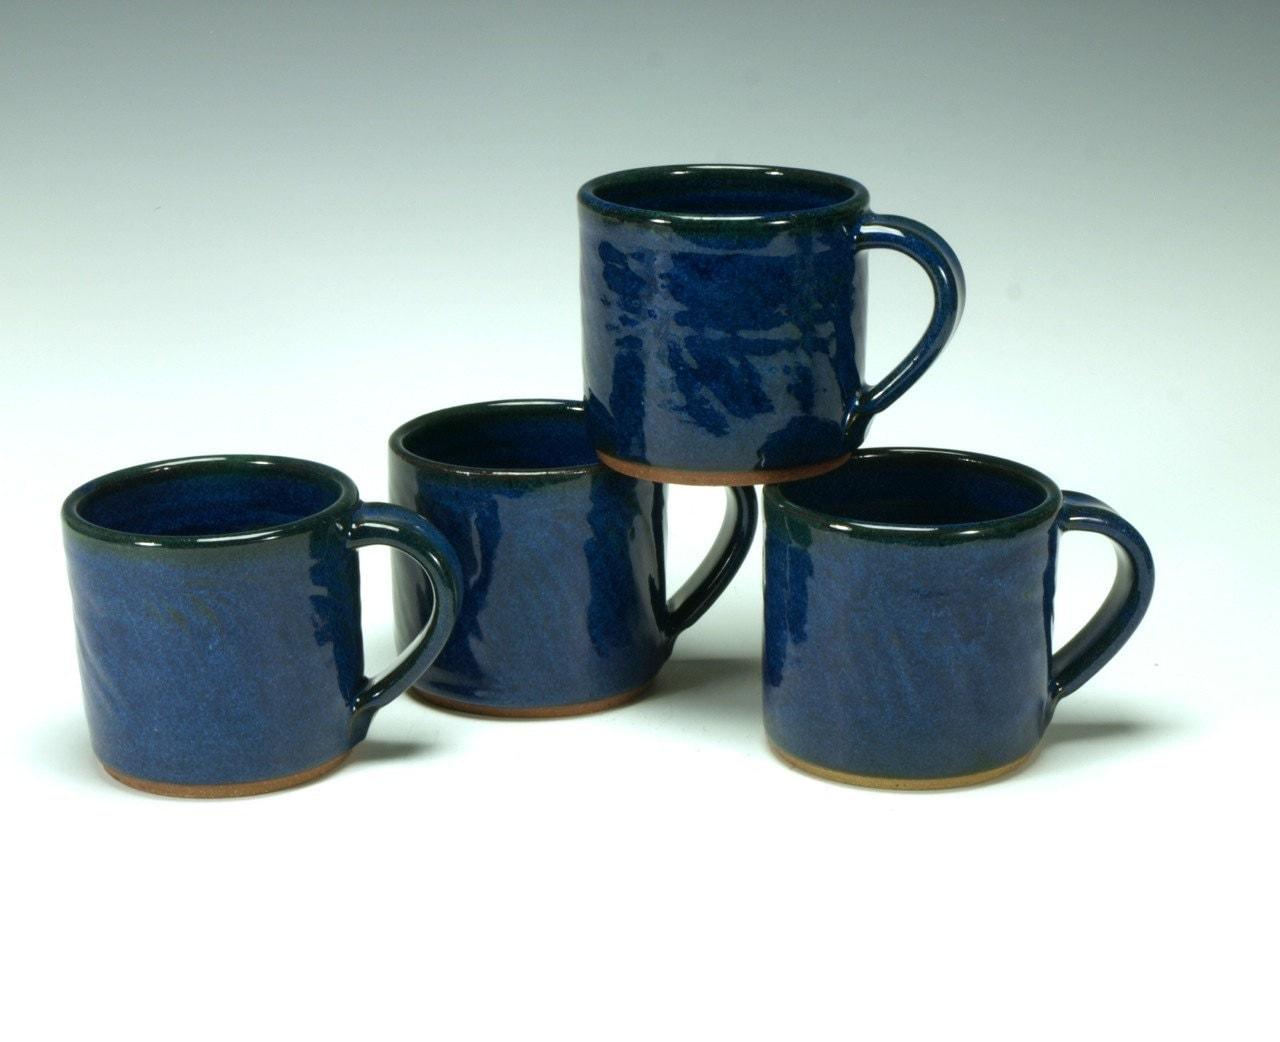 Cobalt blue stoneware mug set - TimcoArtPottery